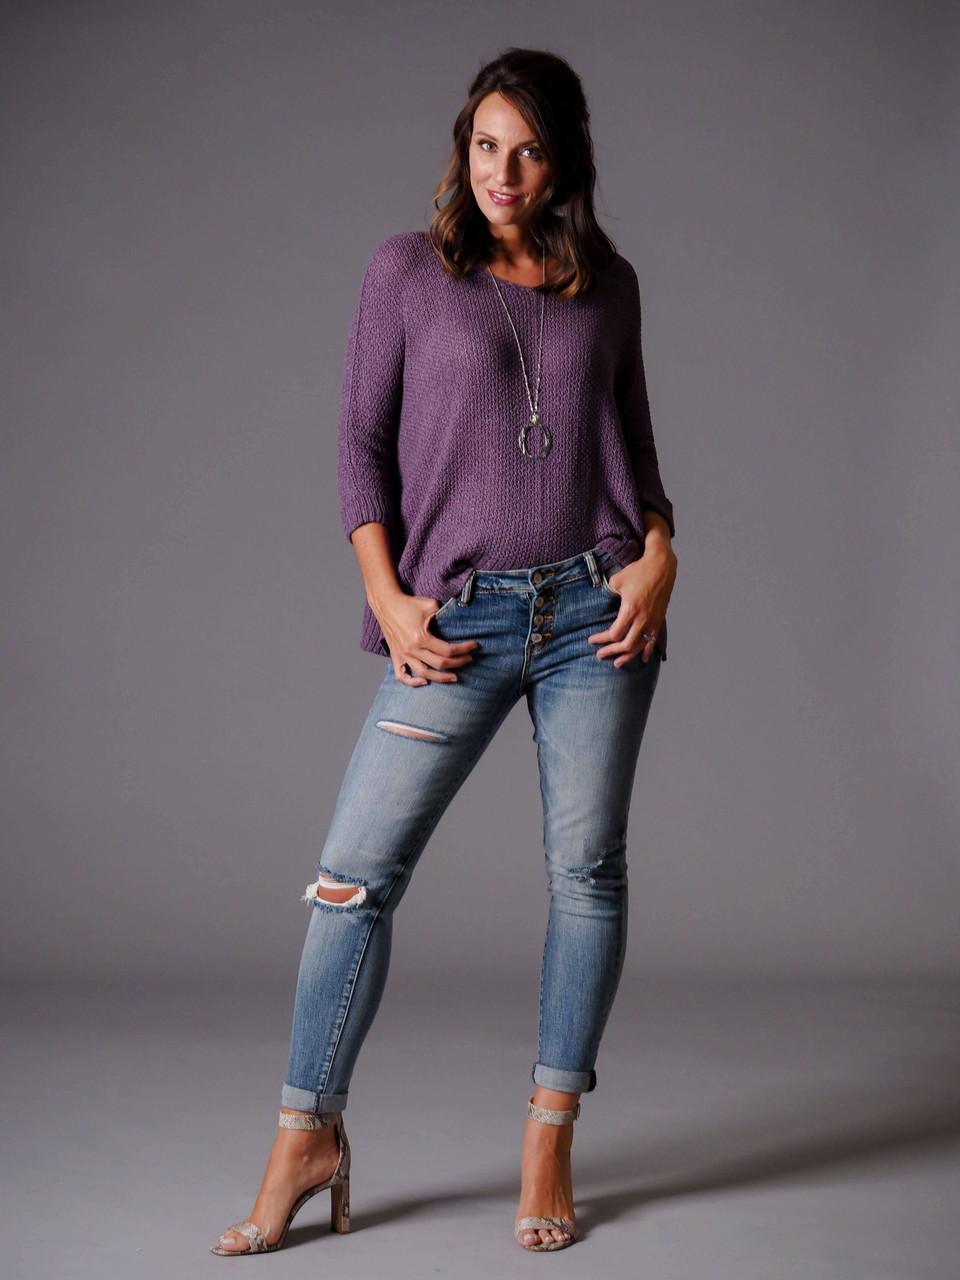 plum purple pullover sweater